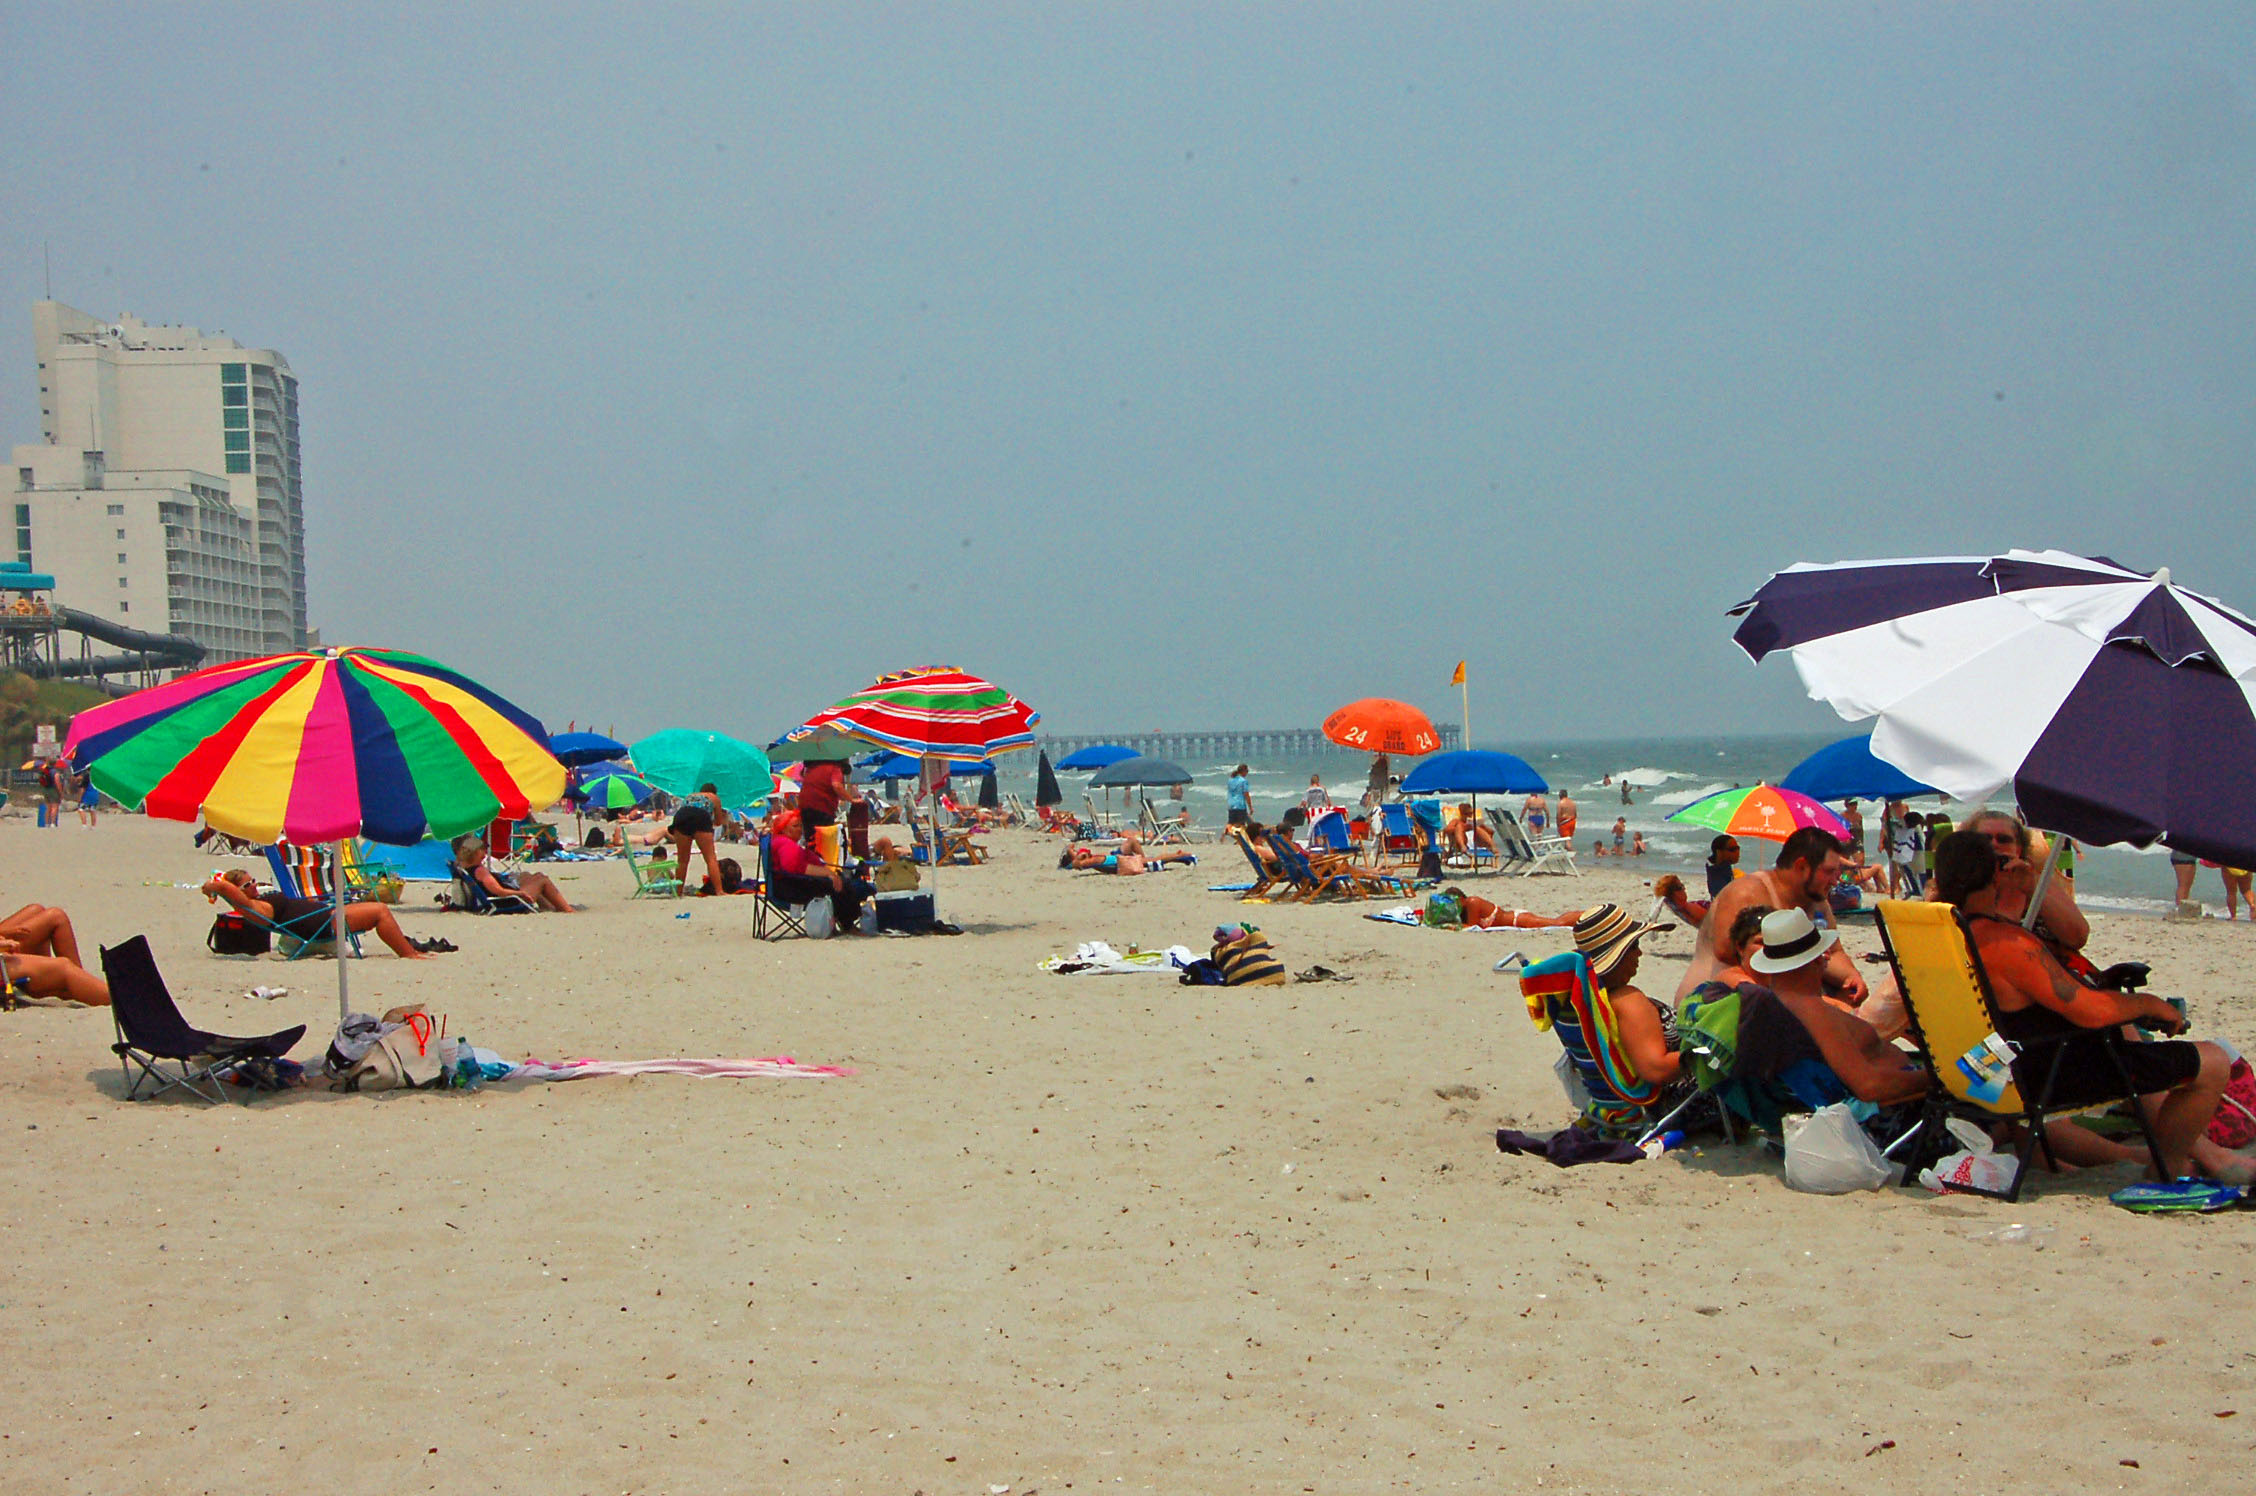 family friendly cities on the east coast myrtle beach 2011 06 22